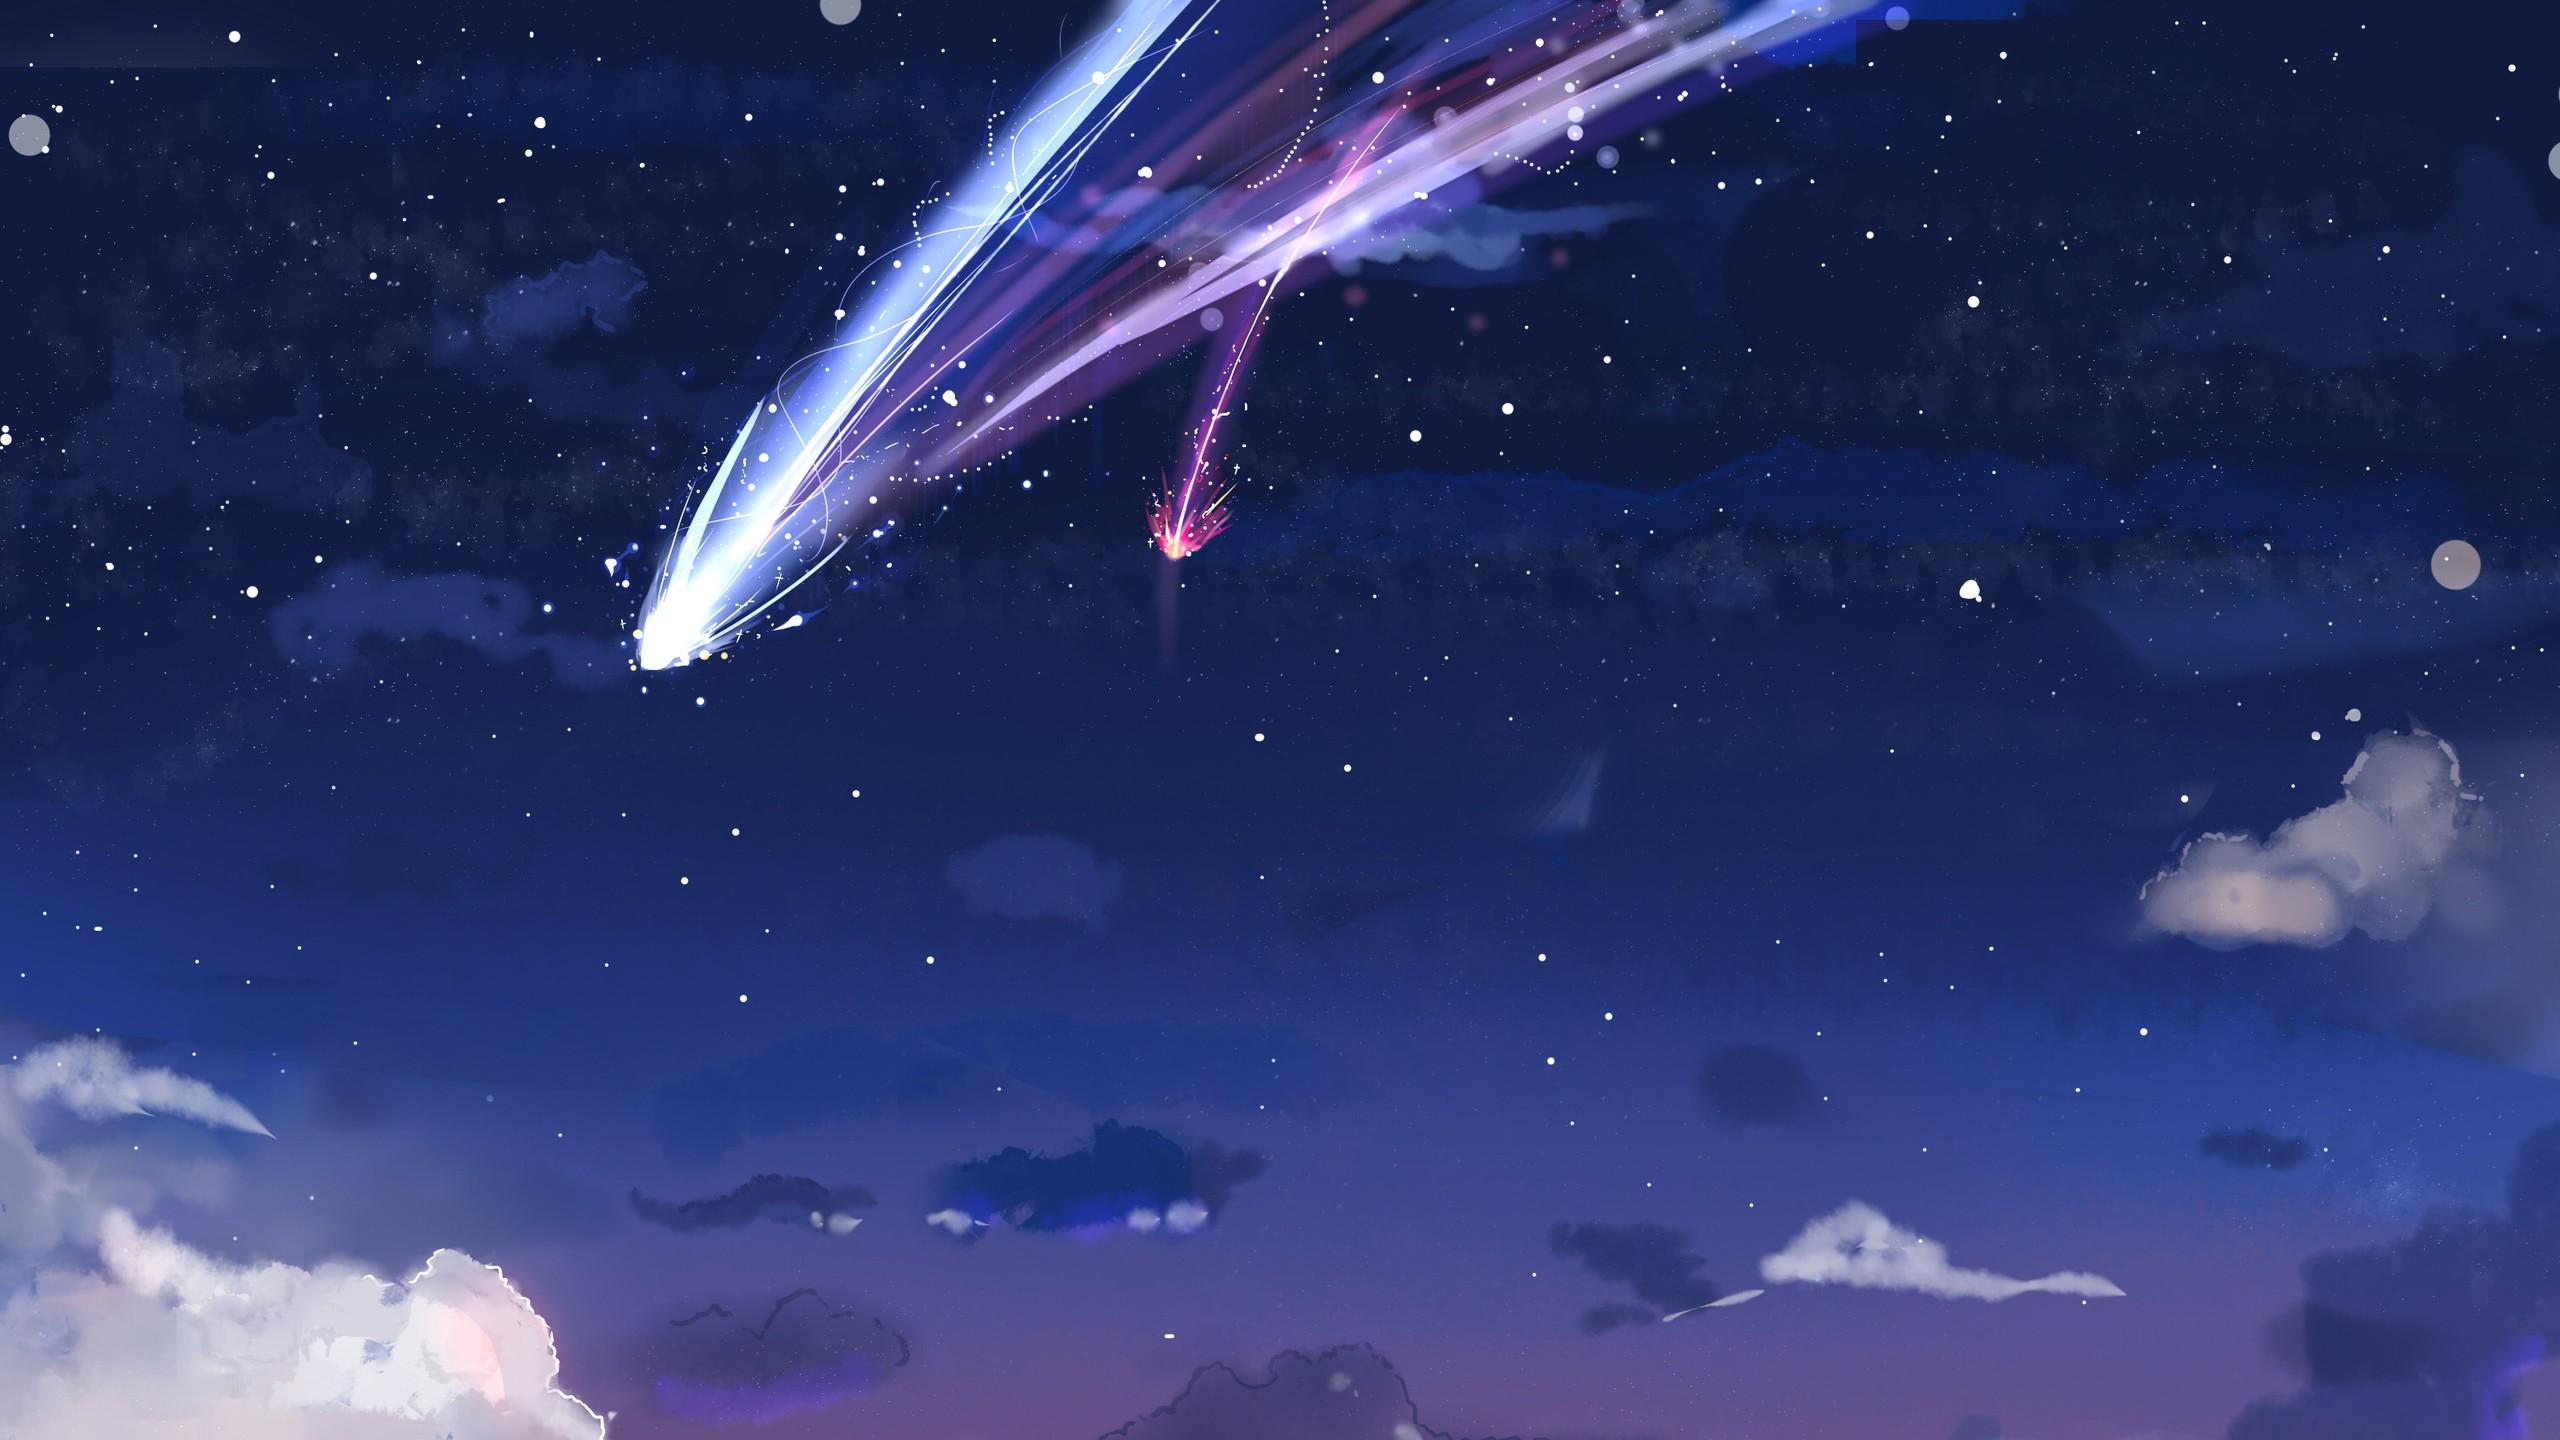 Anime Cloud High Quality